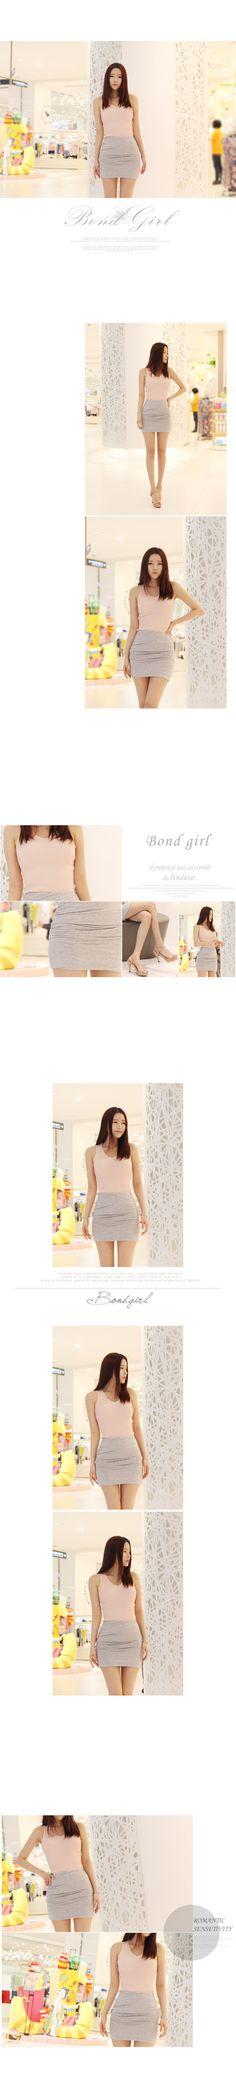 BOND GIRL sleeveless shirt 1070826 < 앙트 나시 < FASHION / CLOTHES < WOMEN < T-SHIRT < sleeveless shirt